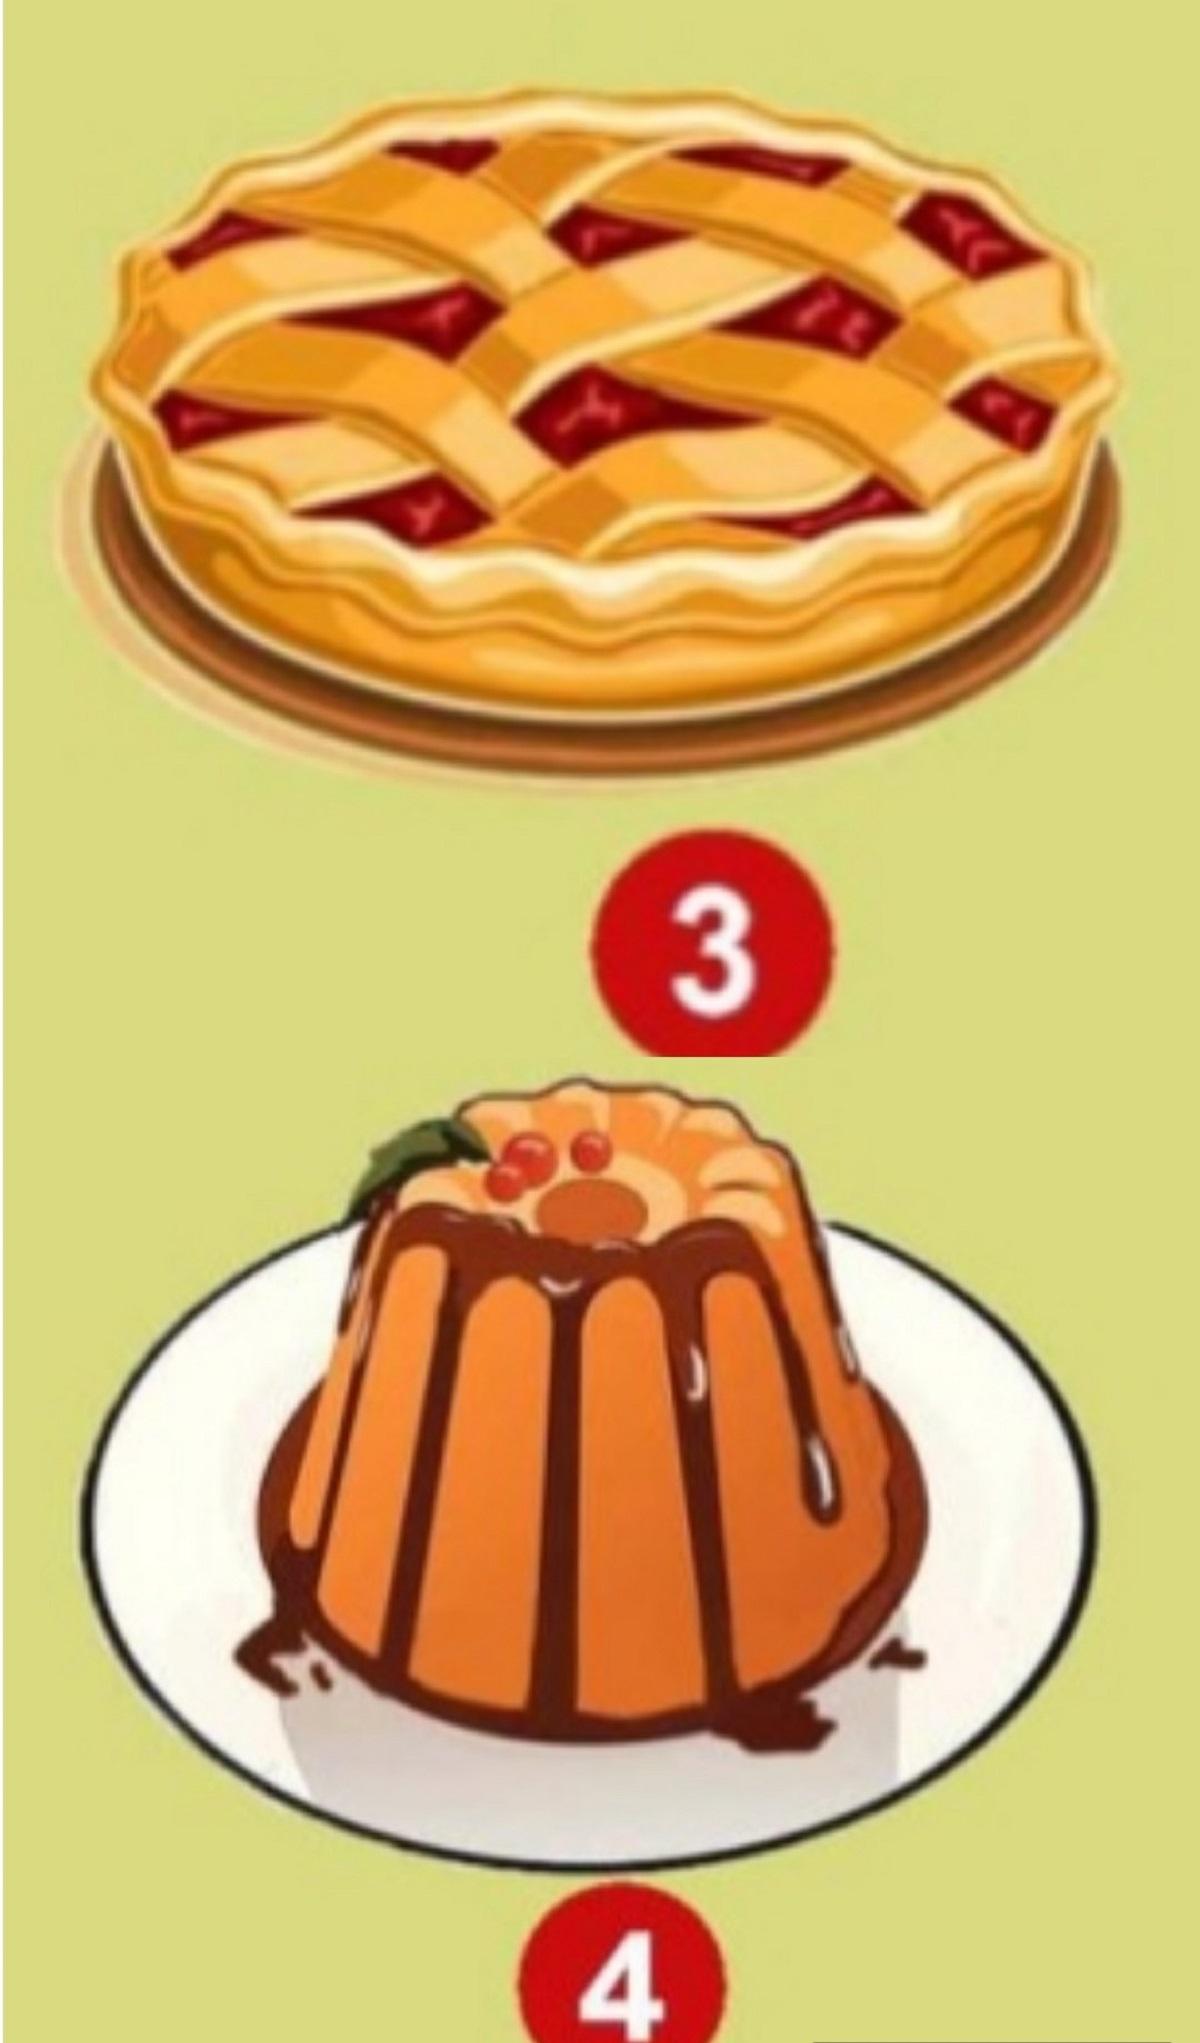 torta e budino